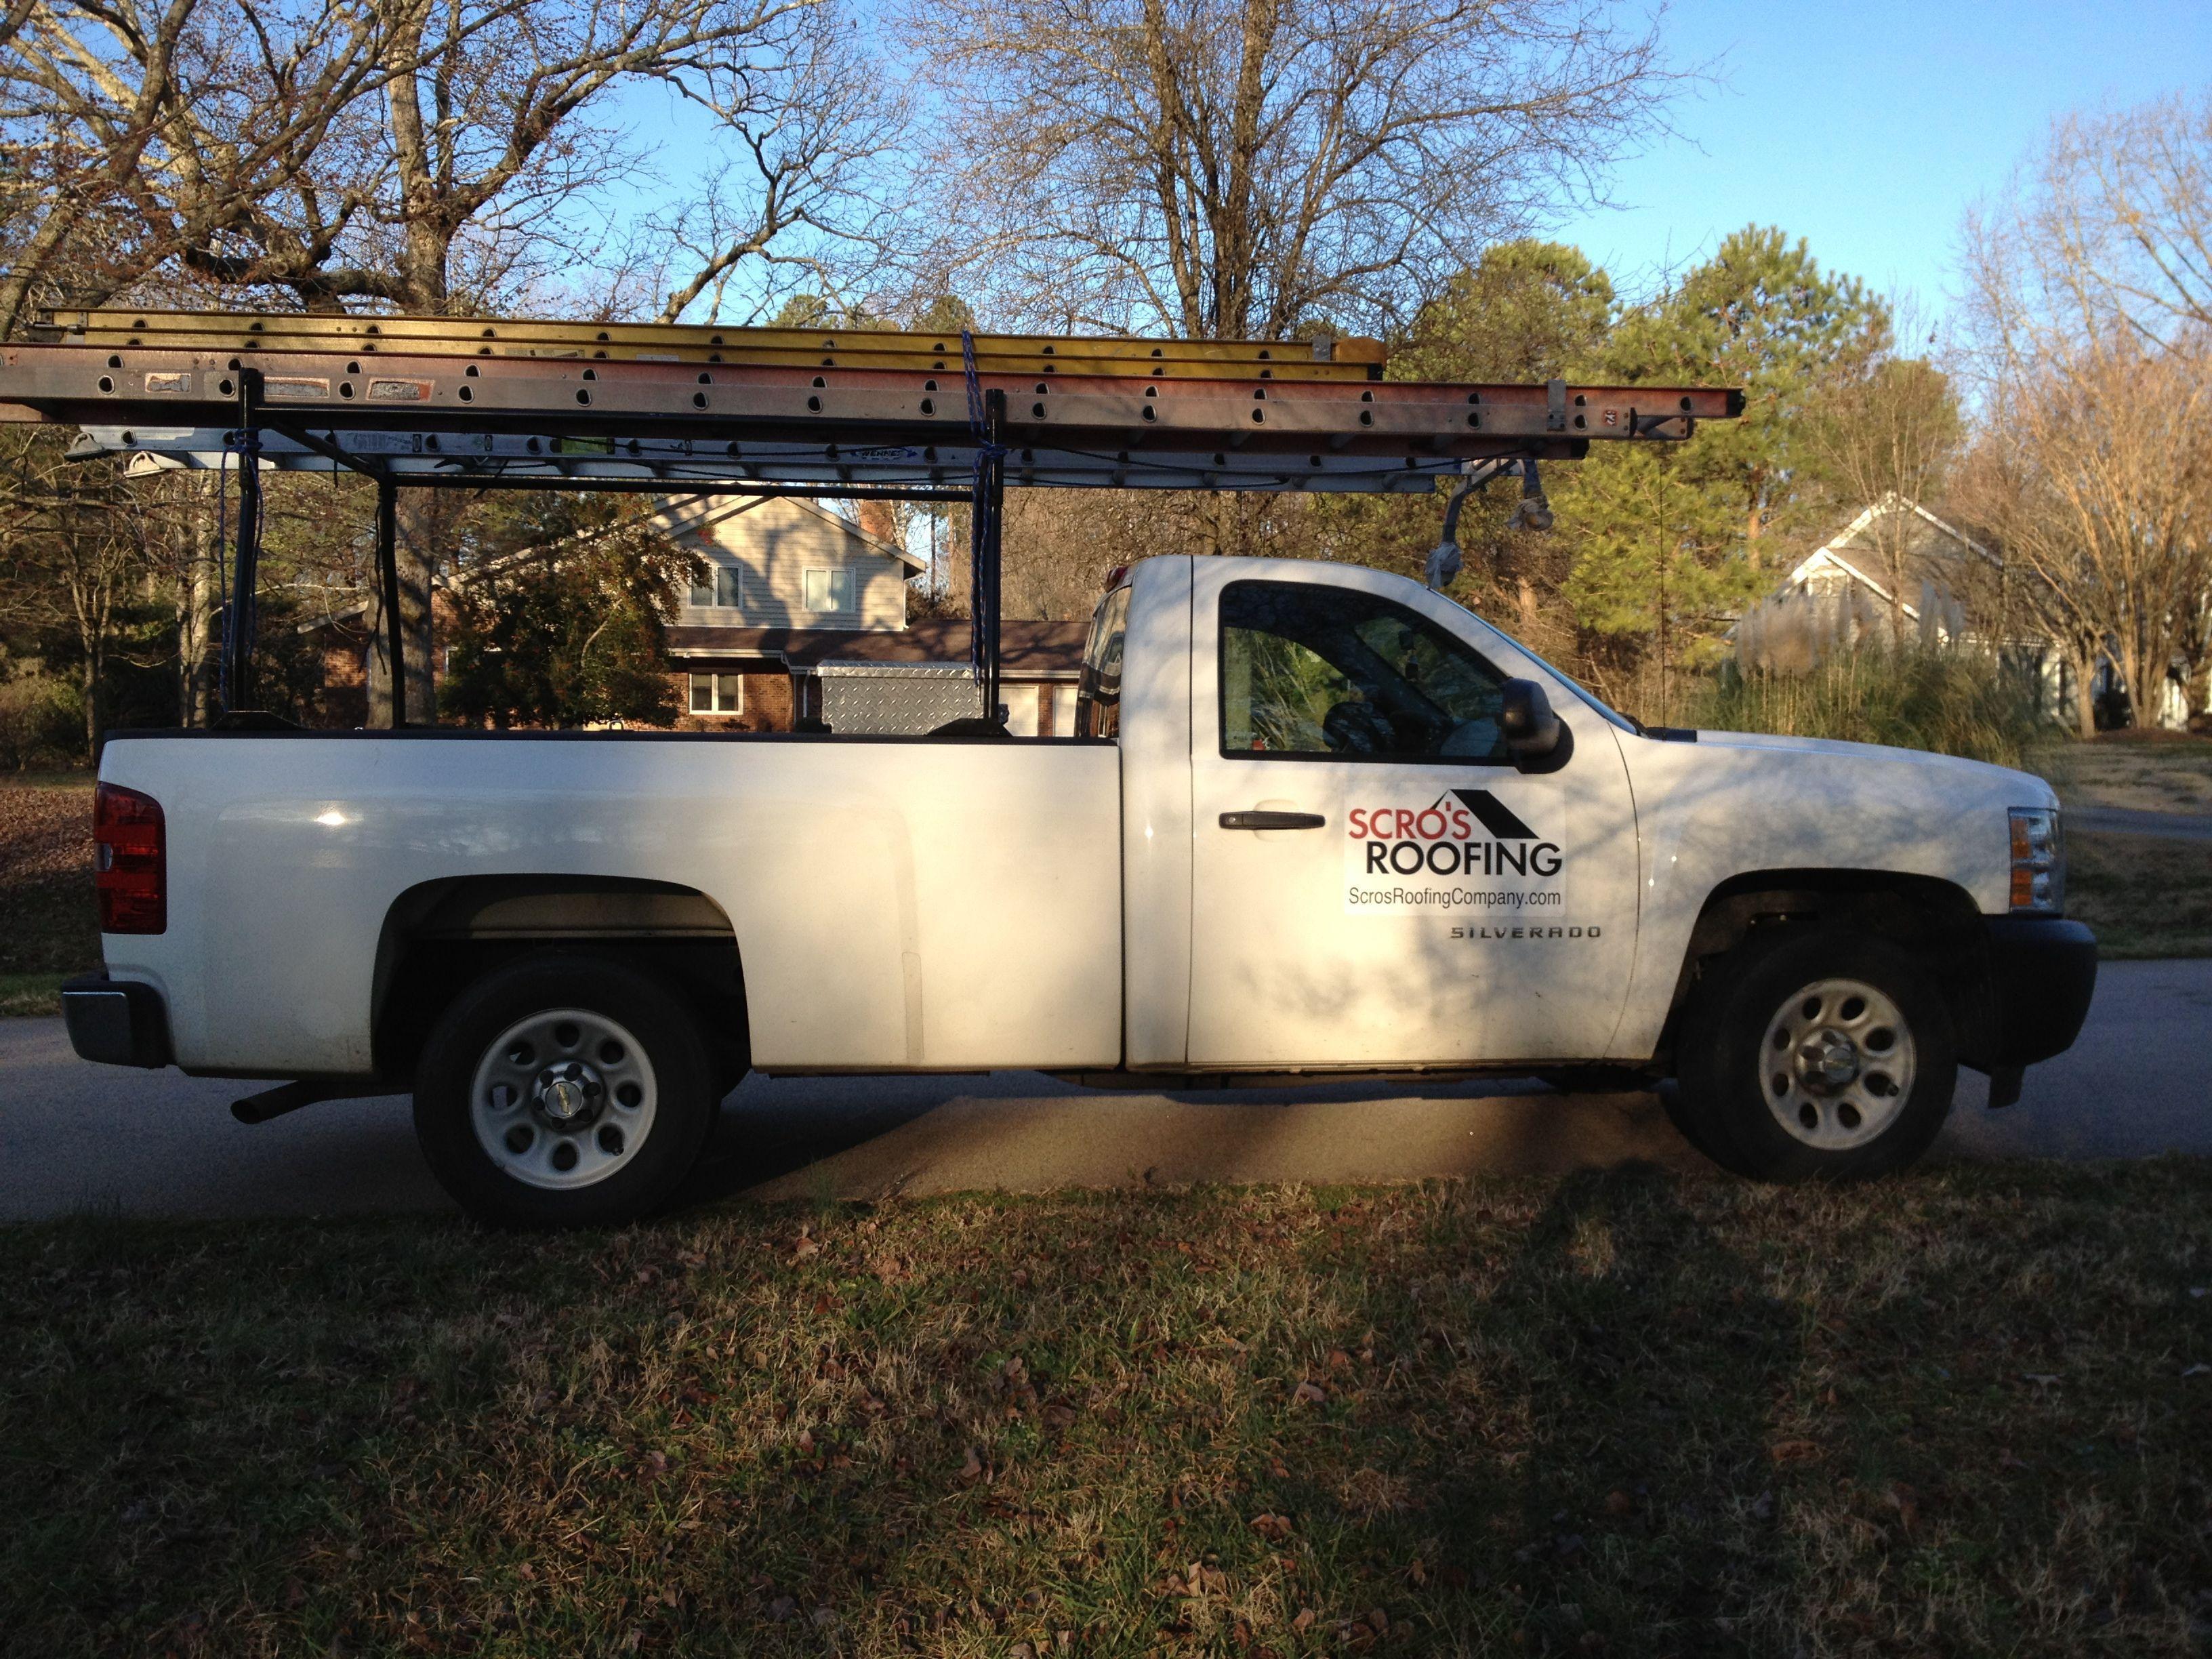 & Scrou0027s Roofing: Truck | Scrou0027s Team | Pinterest | Trucks memphite.com